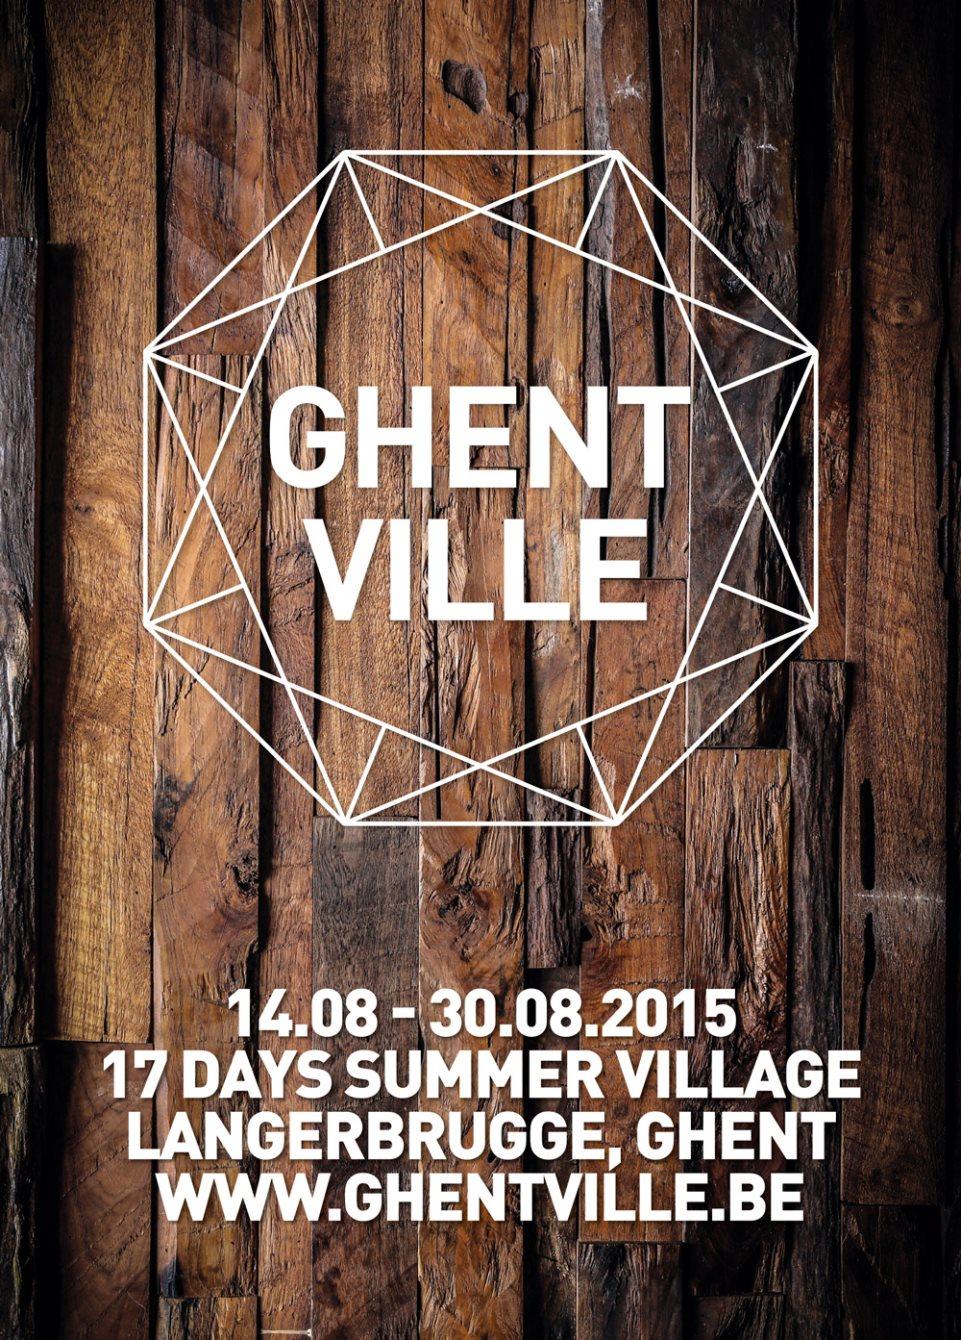 Ghentville 17 Days Summer Village  Opening Weekend - Flyer back